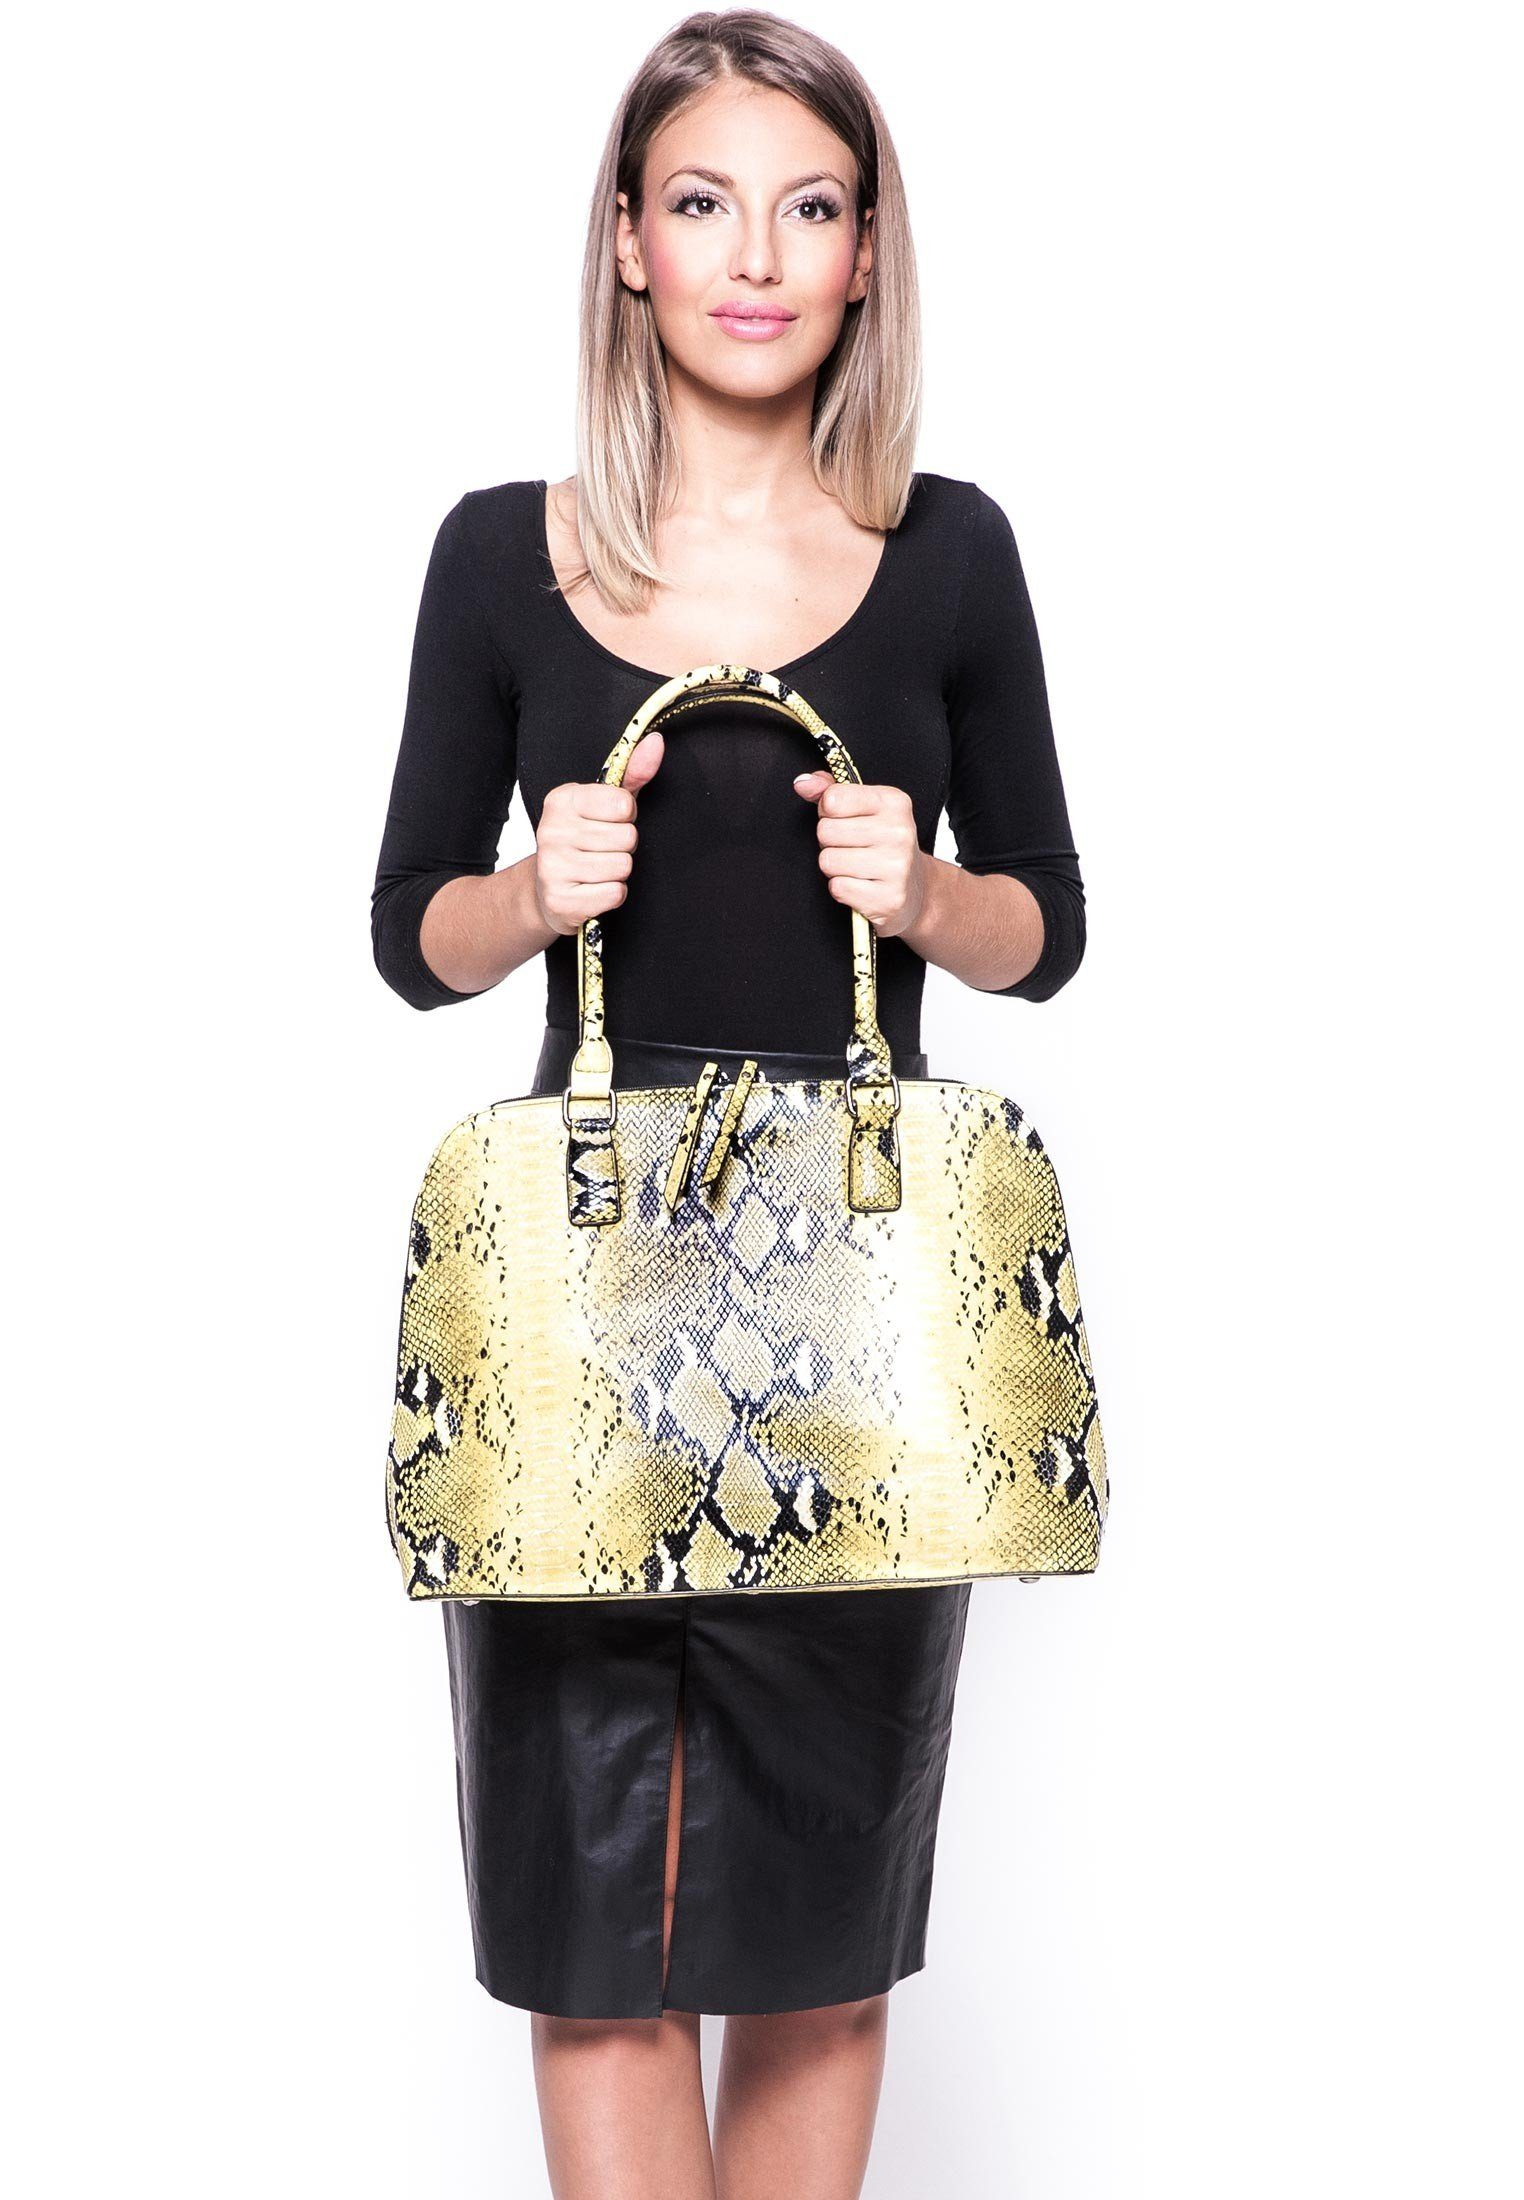 No amp; Kaufen Artikel 8497124299 Shopper Online 9 Emily Emma nr Noah dR0nwI